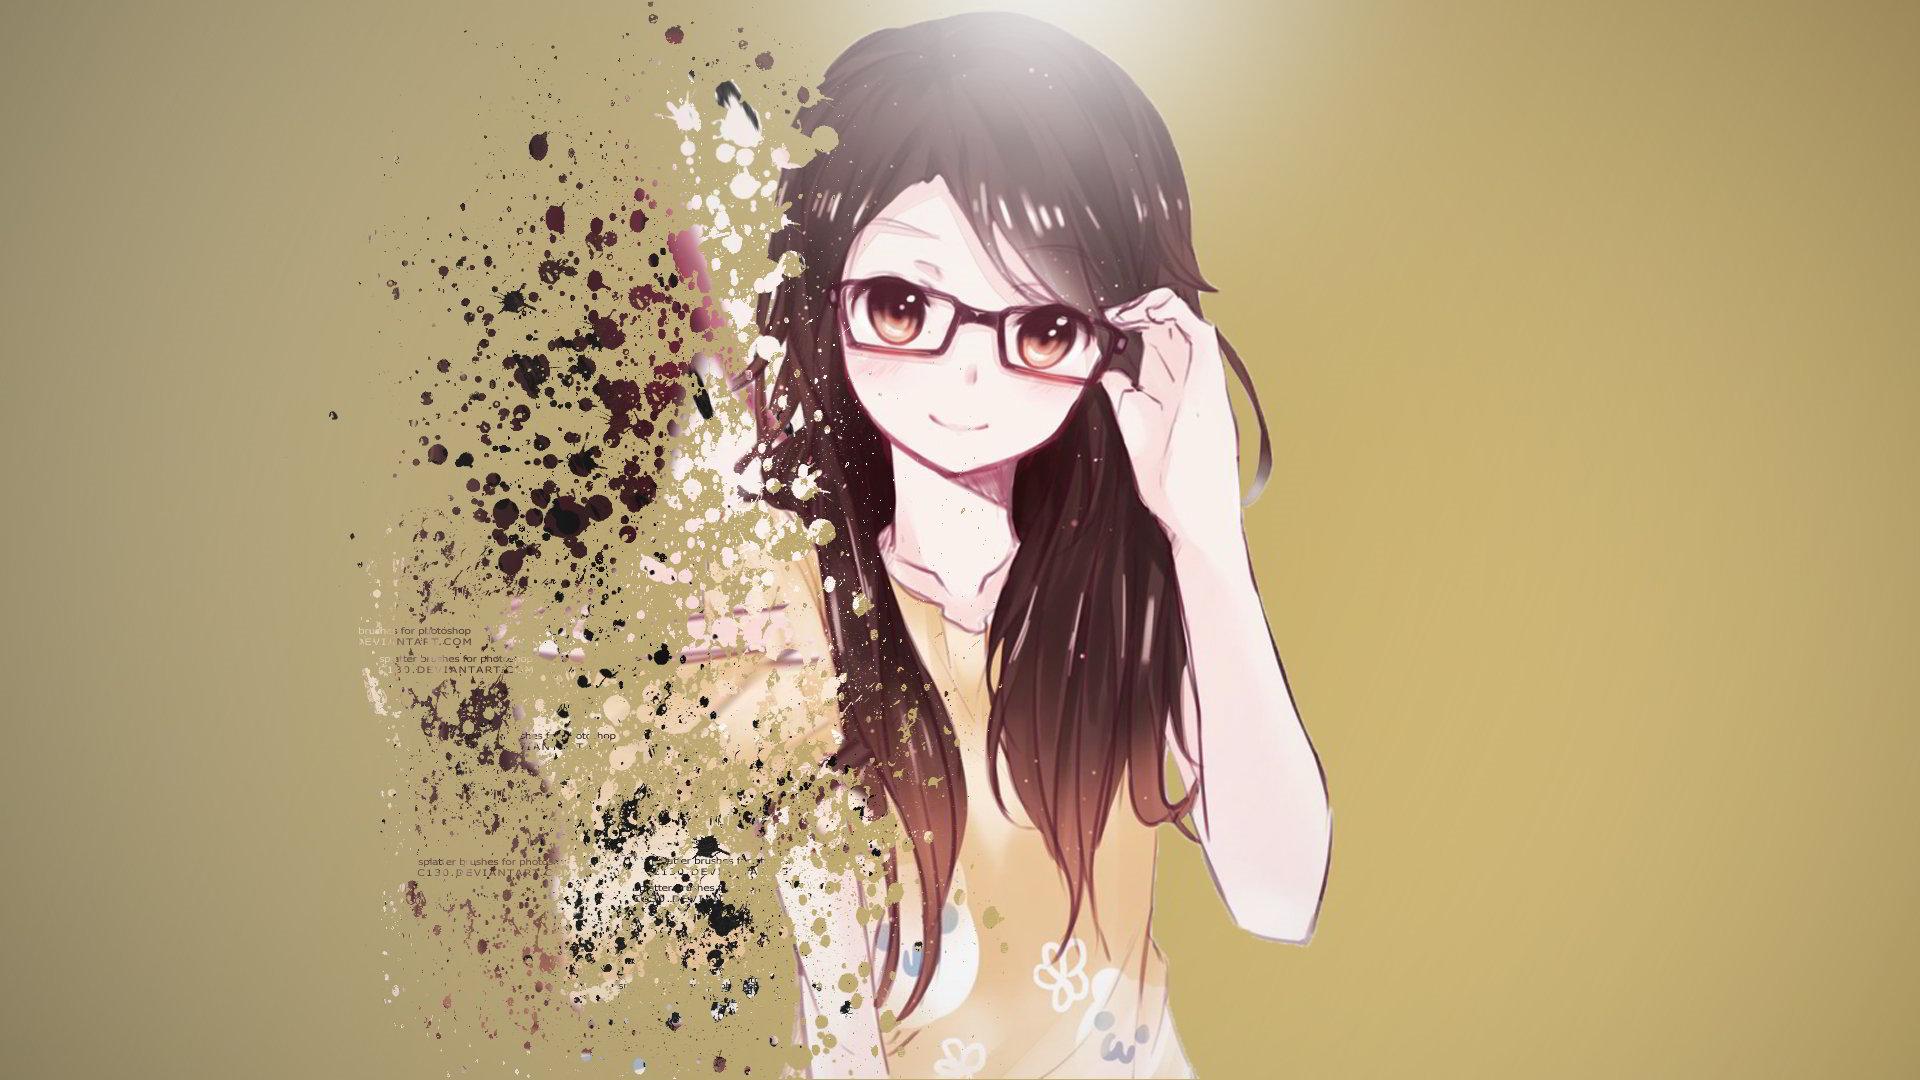 anime girl ca tinh 32